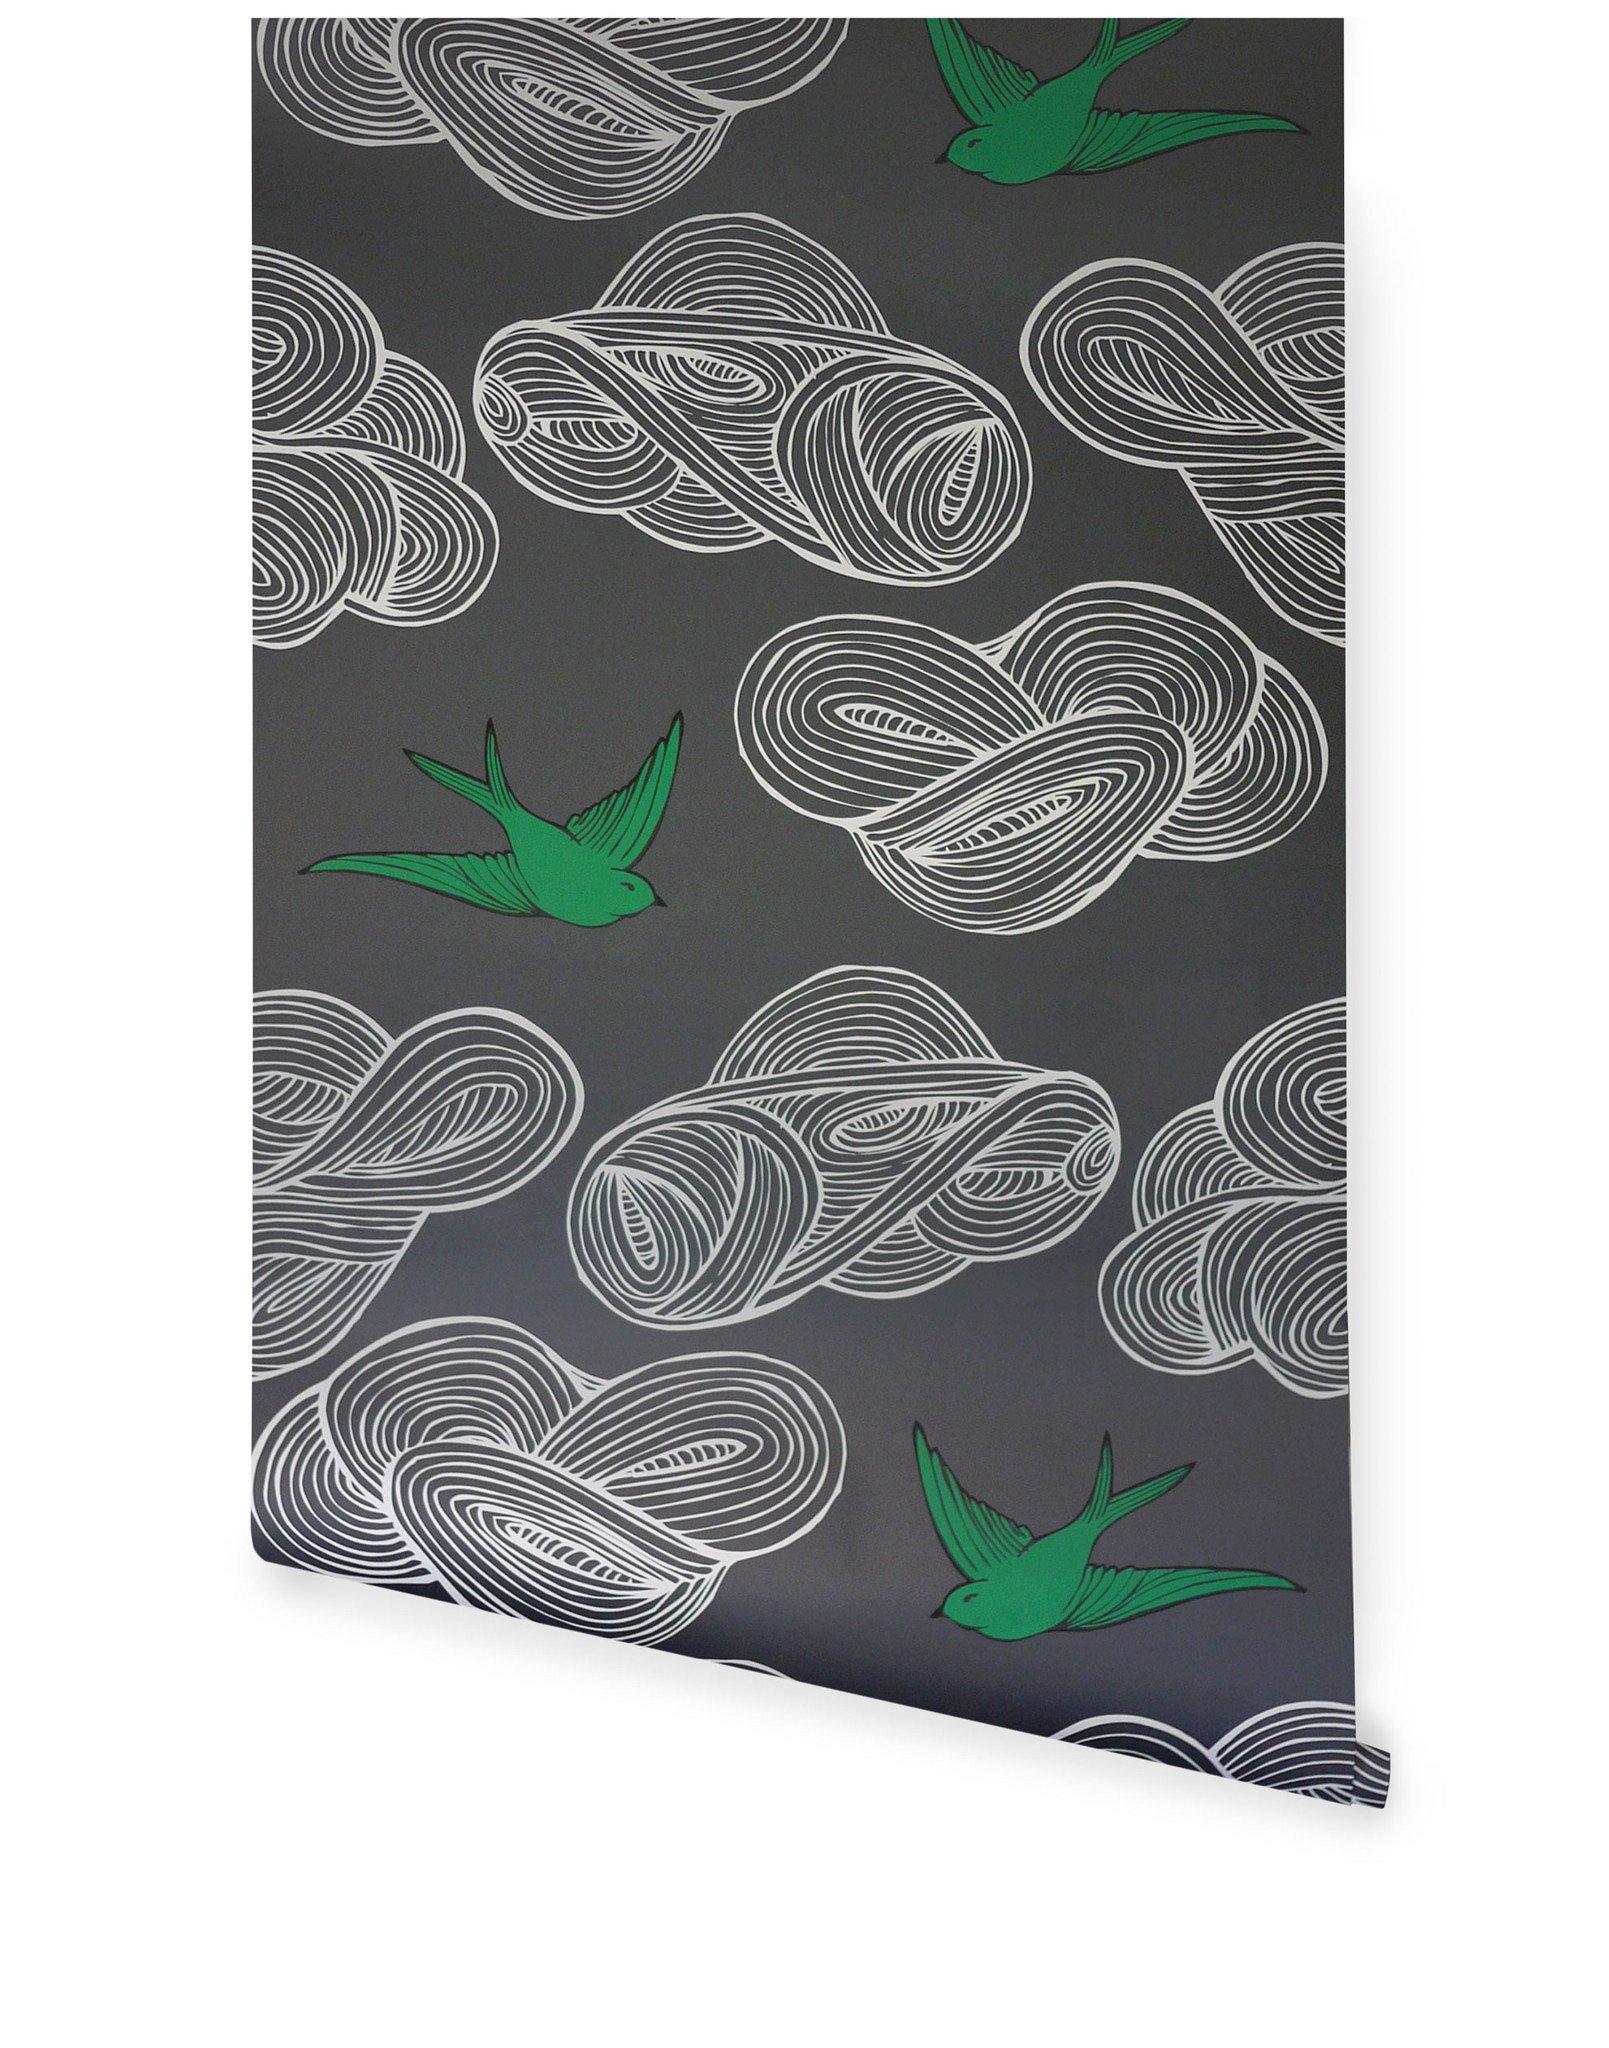 Drawn wallpaper daydream (Gray) Daydream Hygge (Gray) &